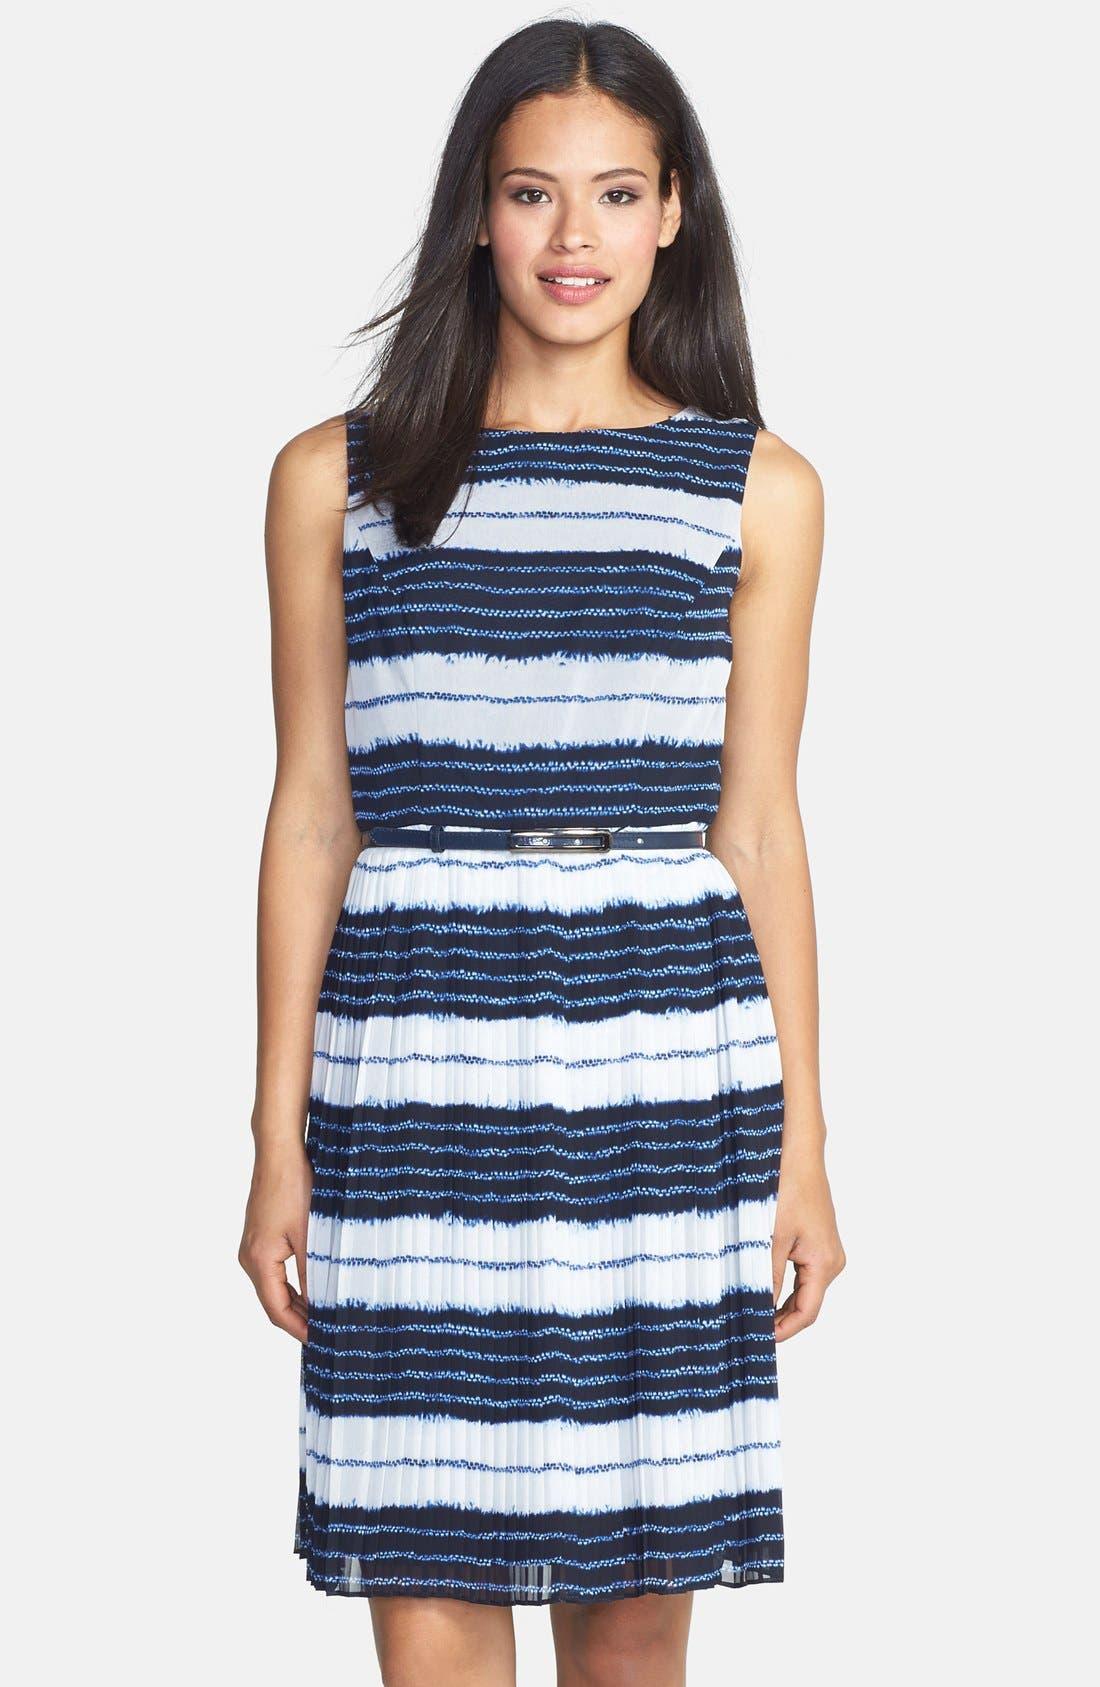 Alternate Image 1 Selected - Adrianna Papell Batik Stripe Print Chiffon Dress